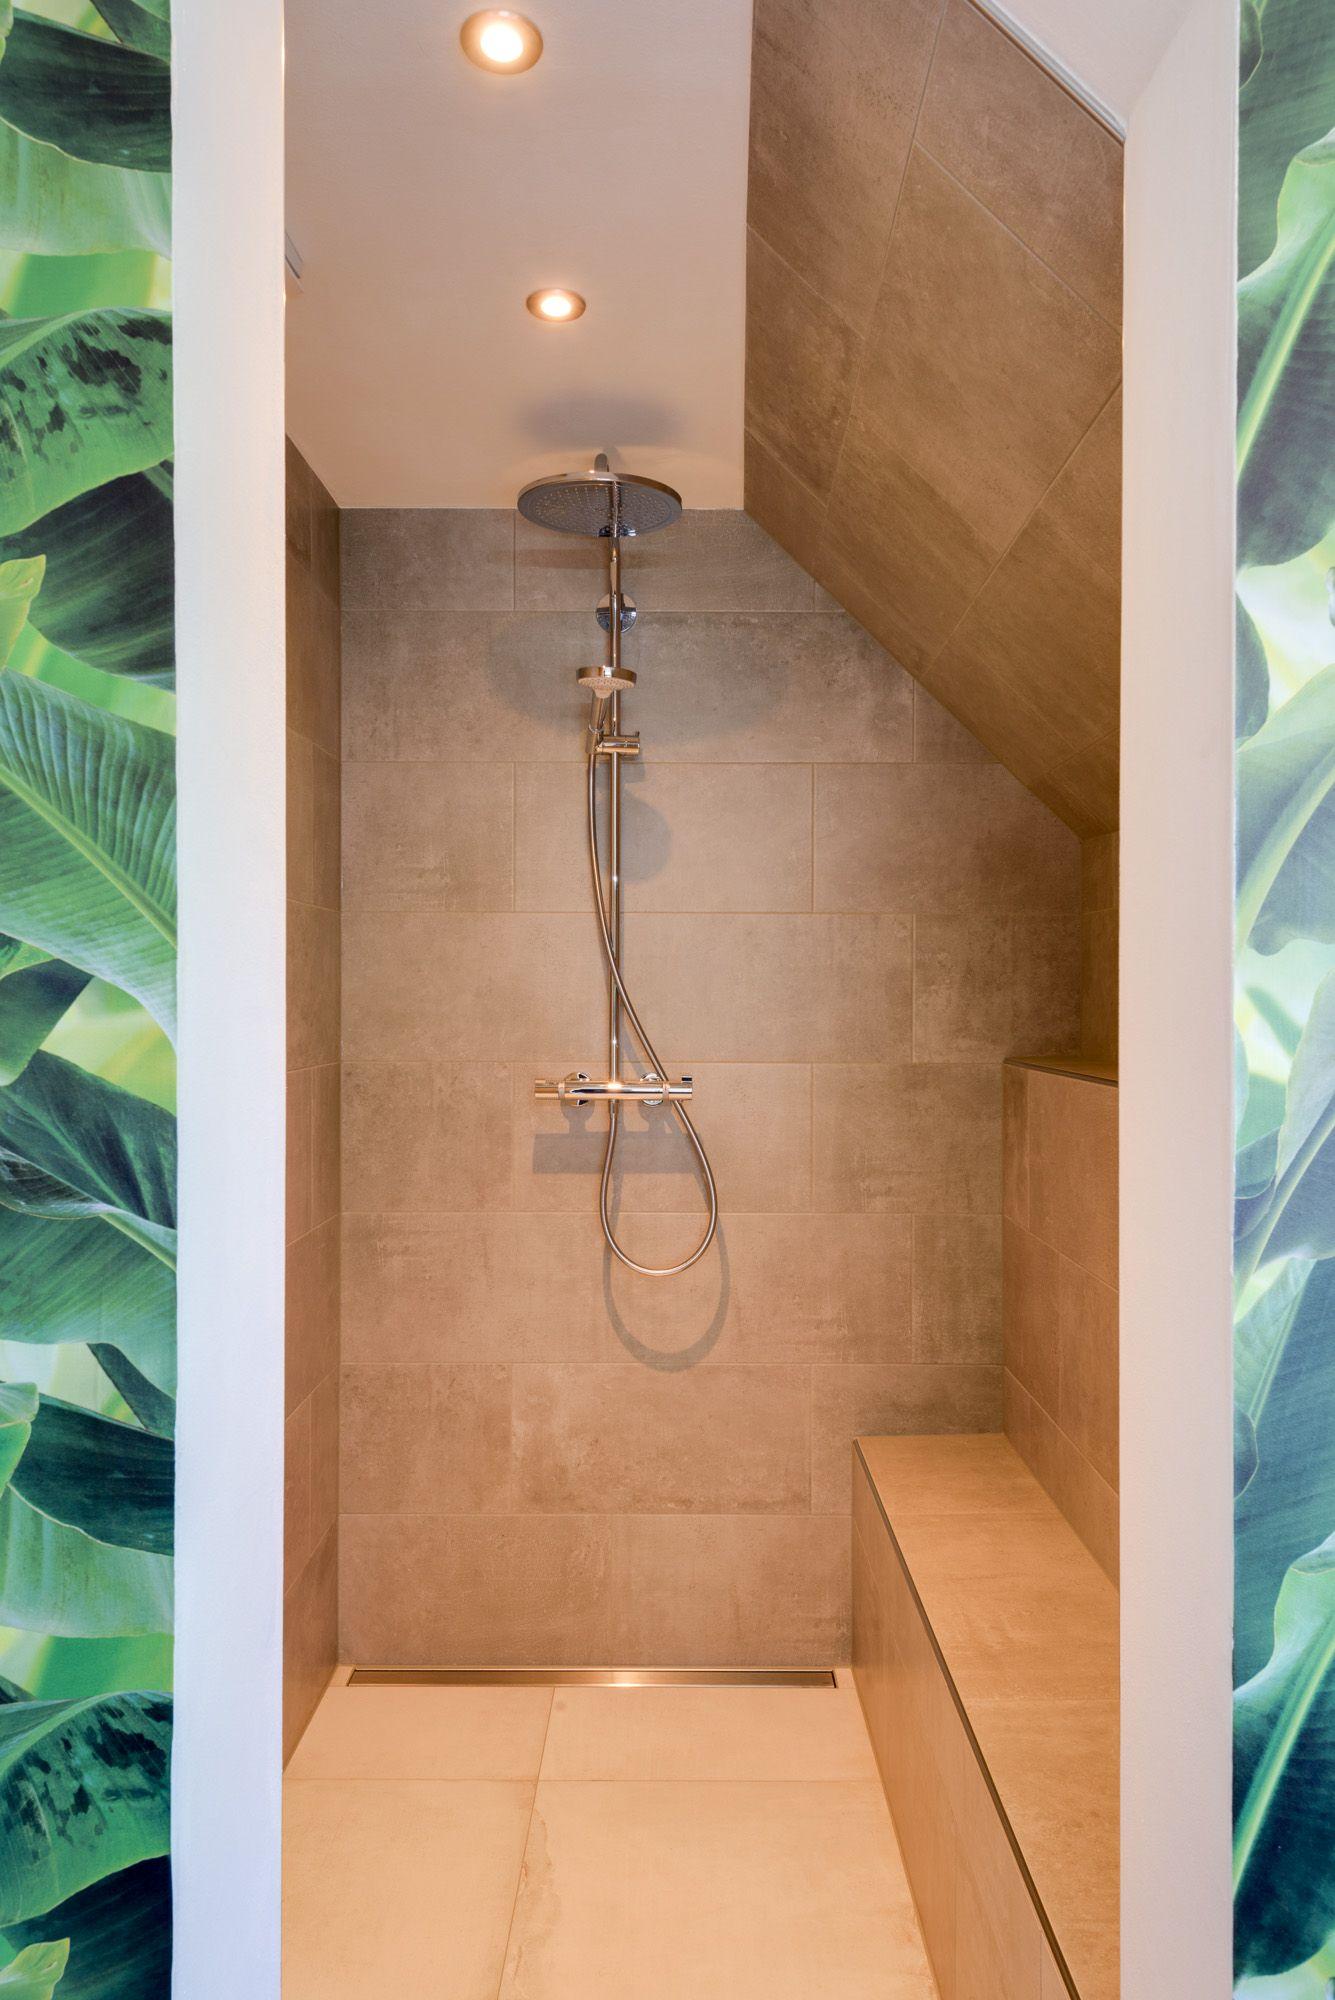 Traumbader Planen Gestalten Dusche Beleuchtung Dusche Warme